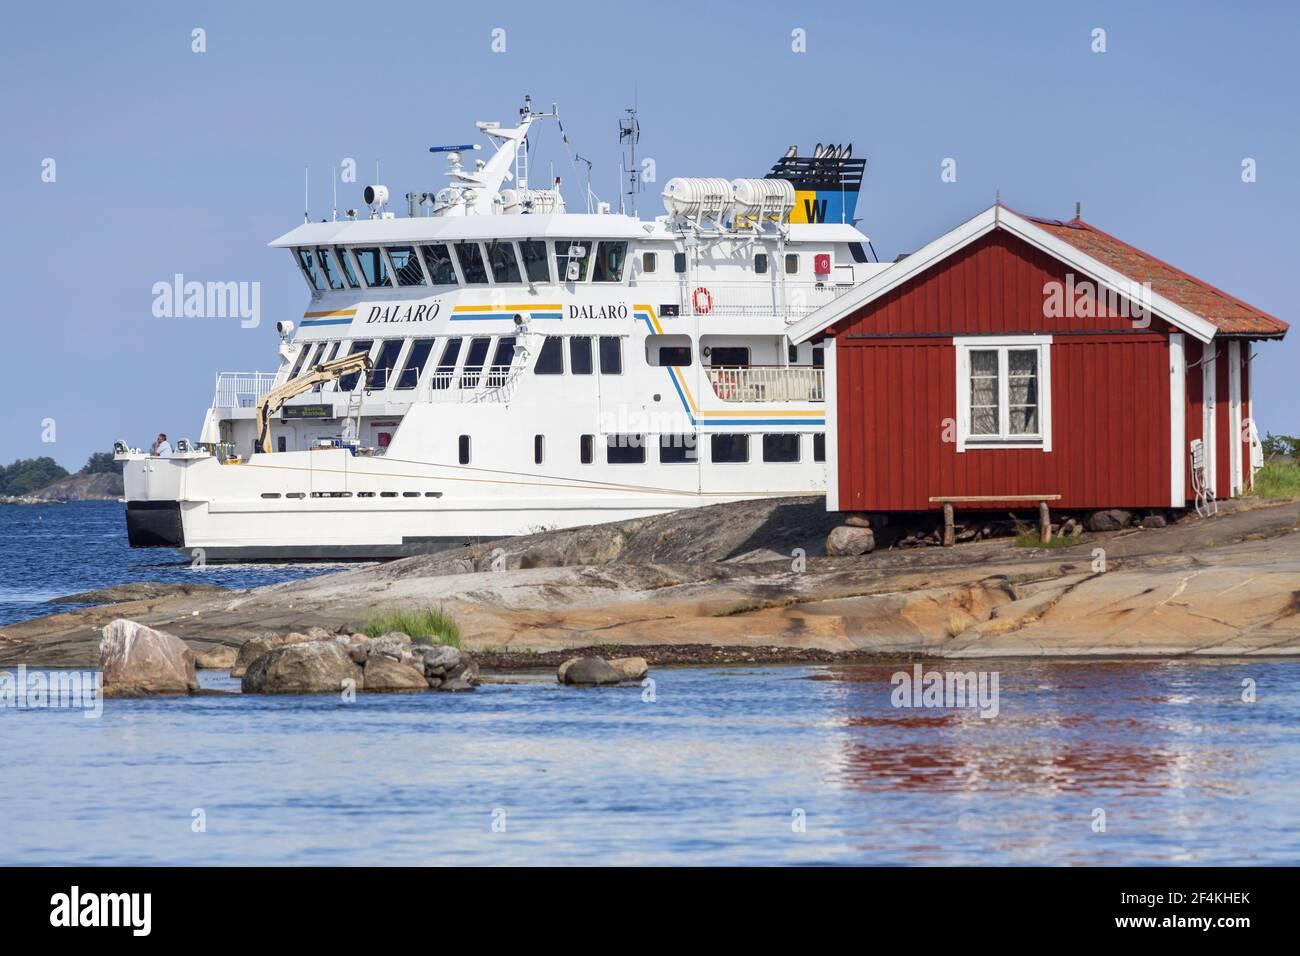 geography / travel, Sweden, Stockholm laen, Stockholm skårgården, ferry boat Vånoe near the entrance i, Additional-Rights-Clearance-Info-Not-Available Stock Photo